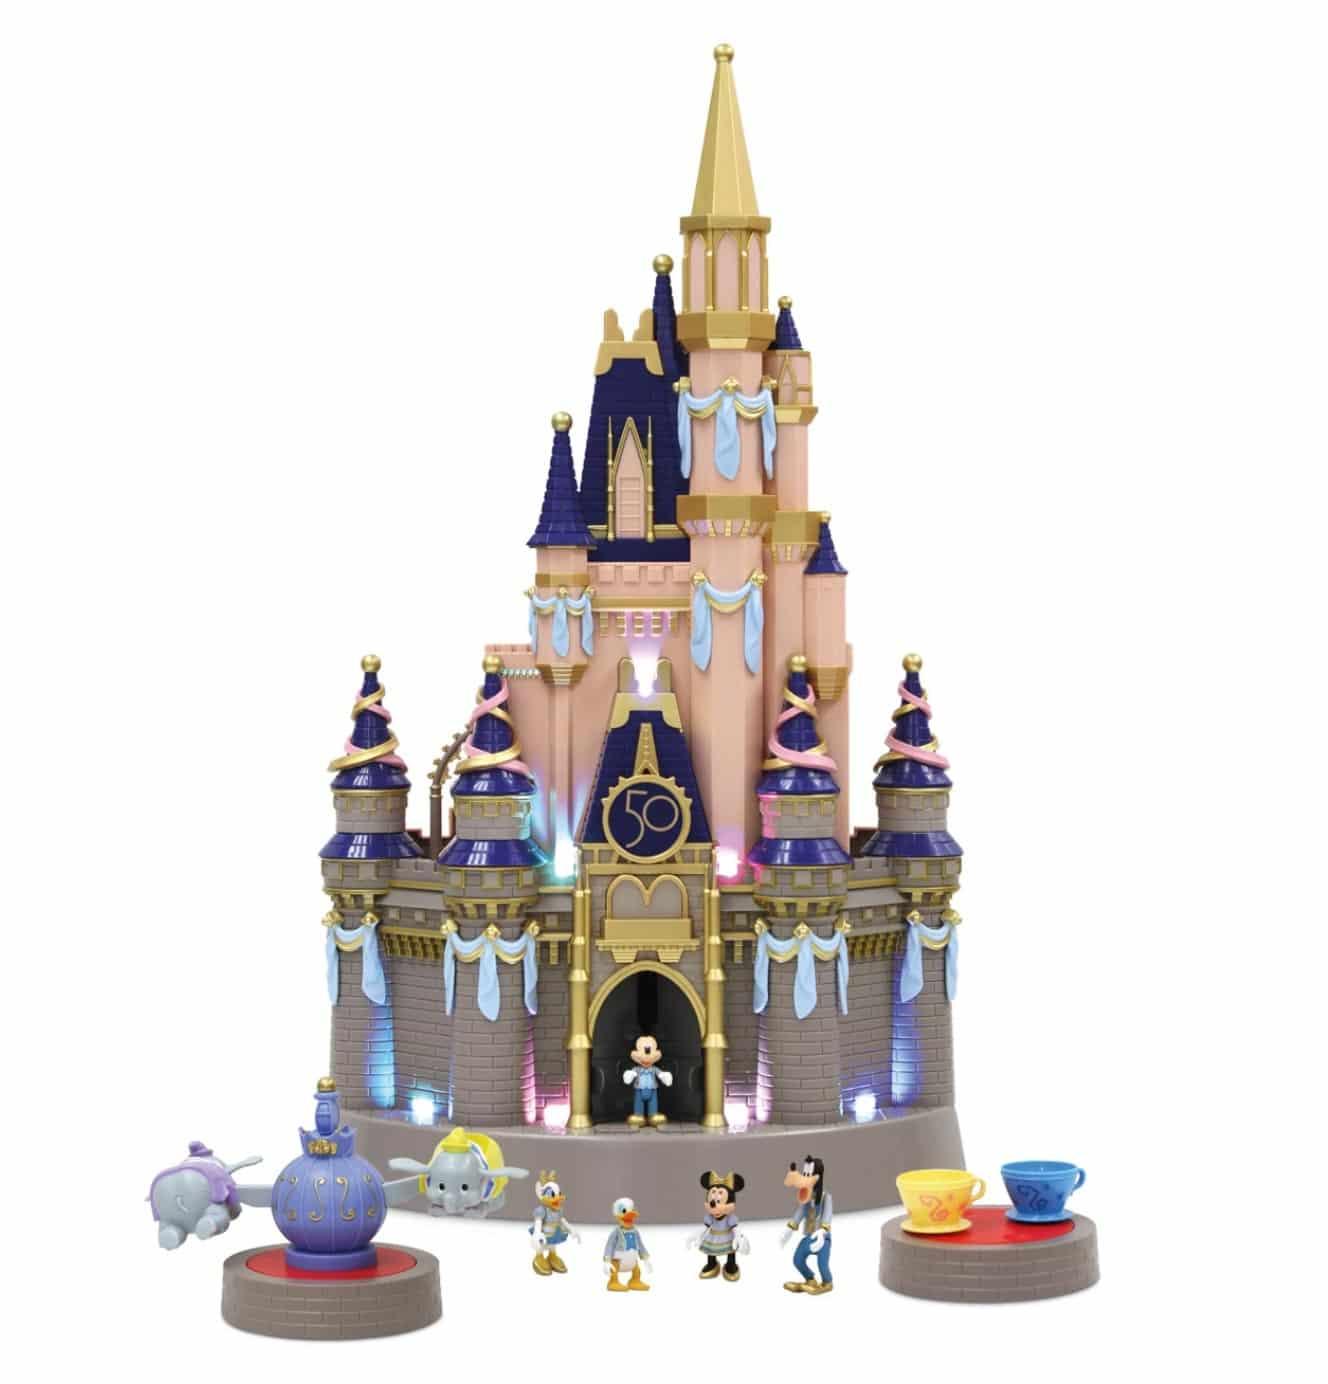 Cinderella Castle Playset - Disney World 50th Anniversary